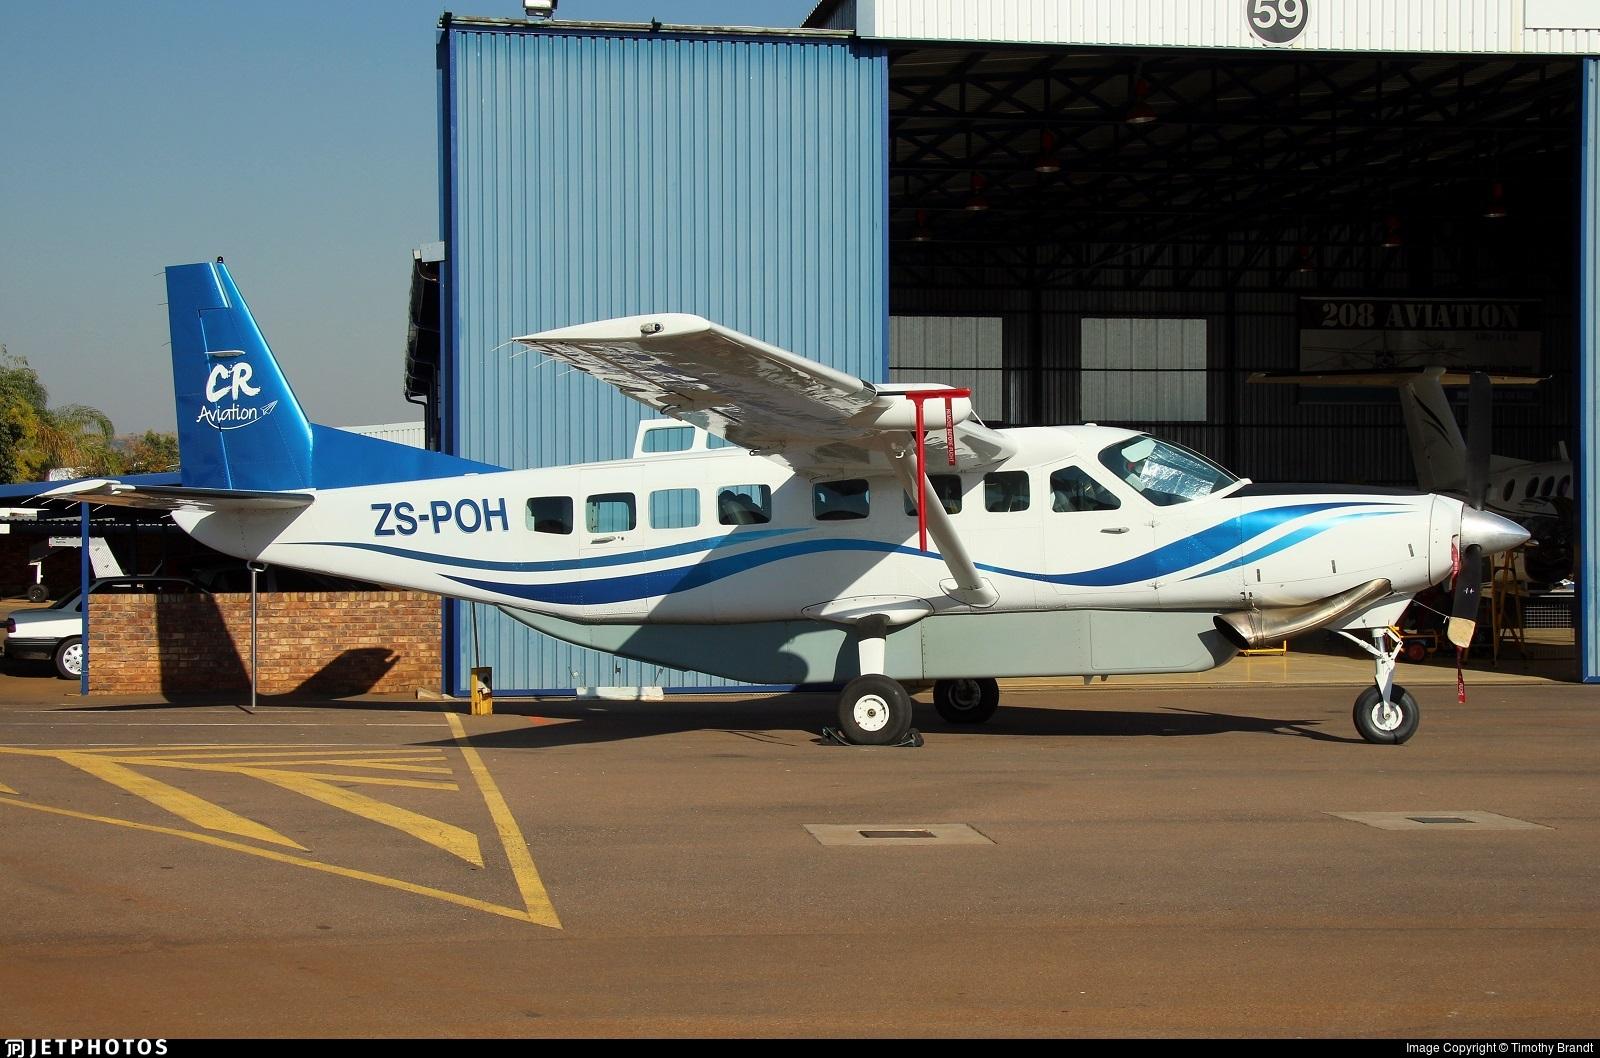 zs poh cessna 208b grand caravan cr aviation timothy brandt rh jetphotos com Cessna 208 Caravan Cockpit Cessna 208 Caravan Cockpit